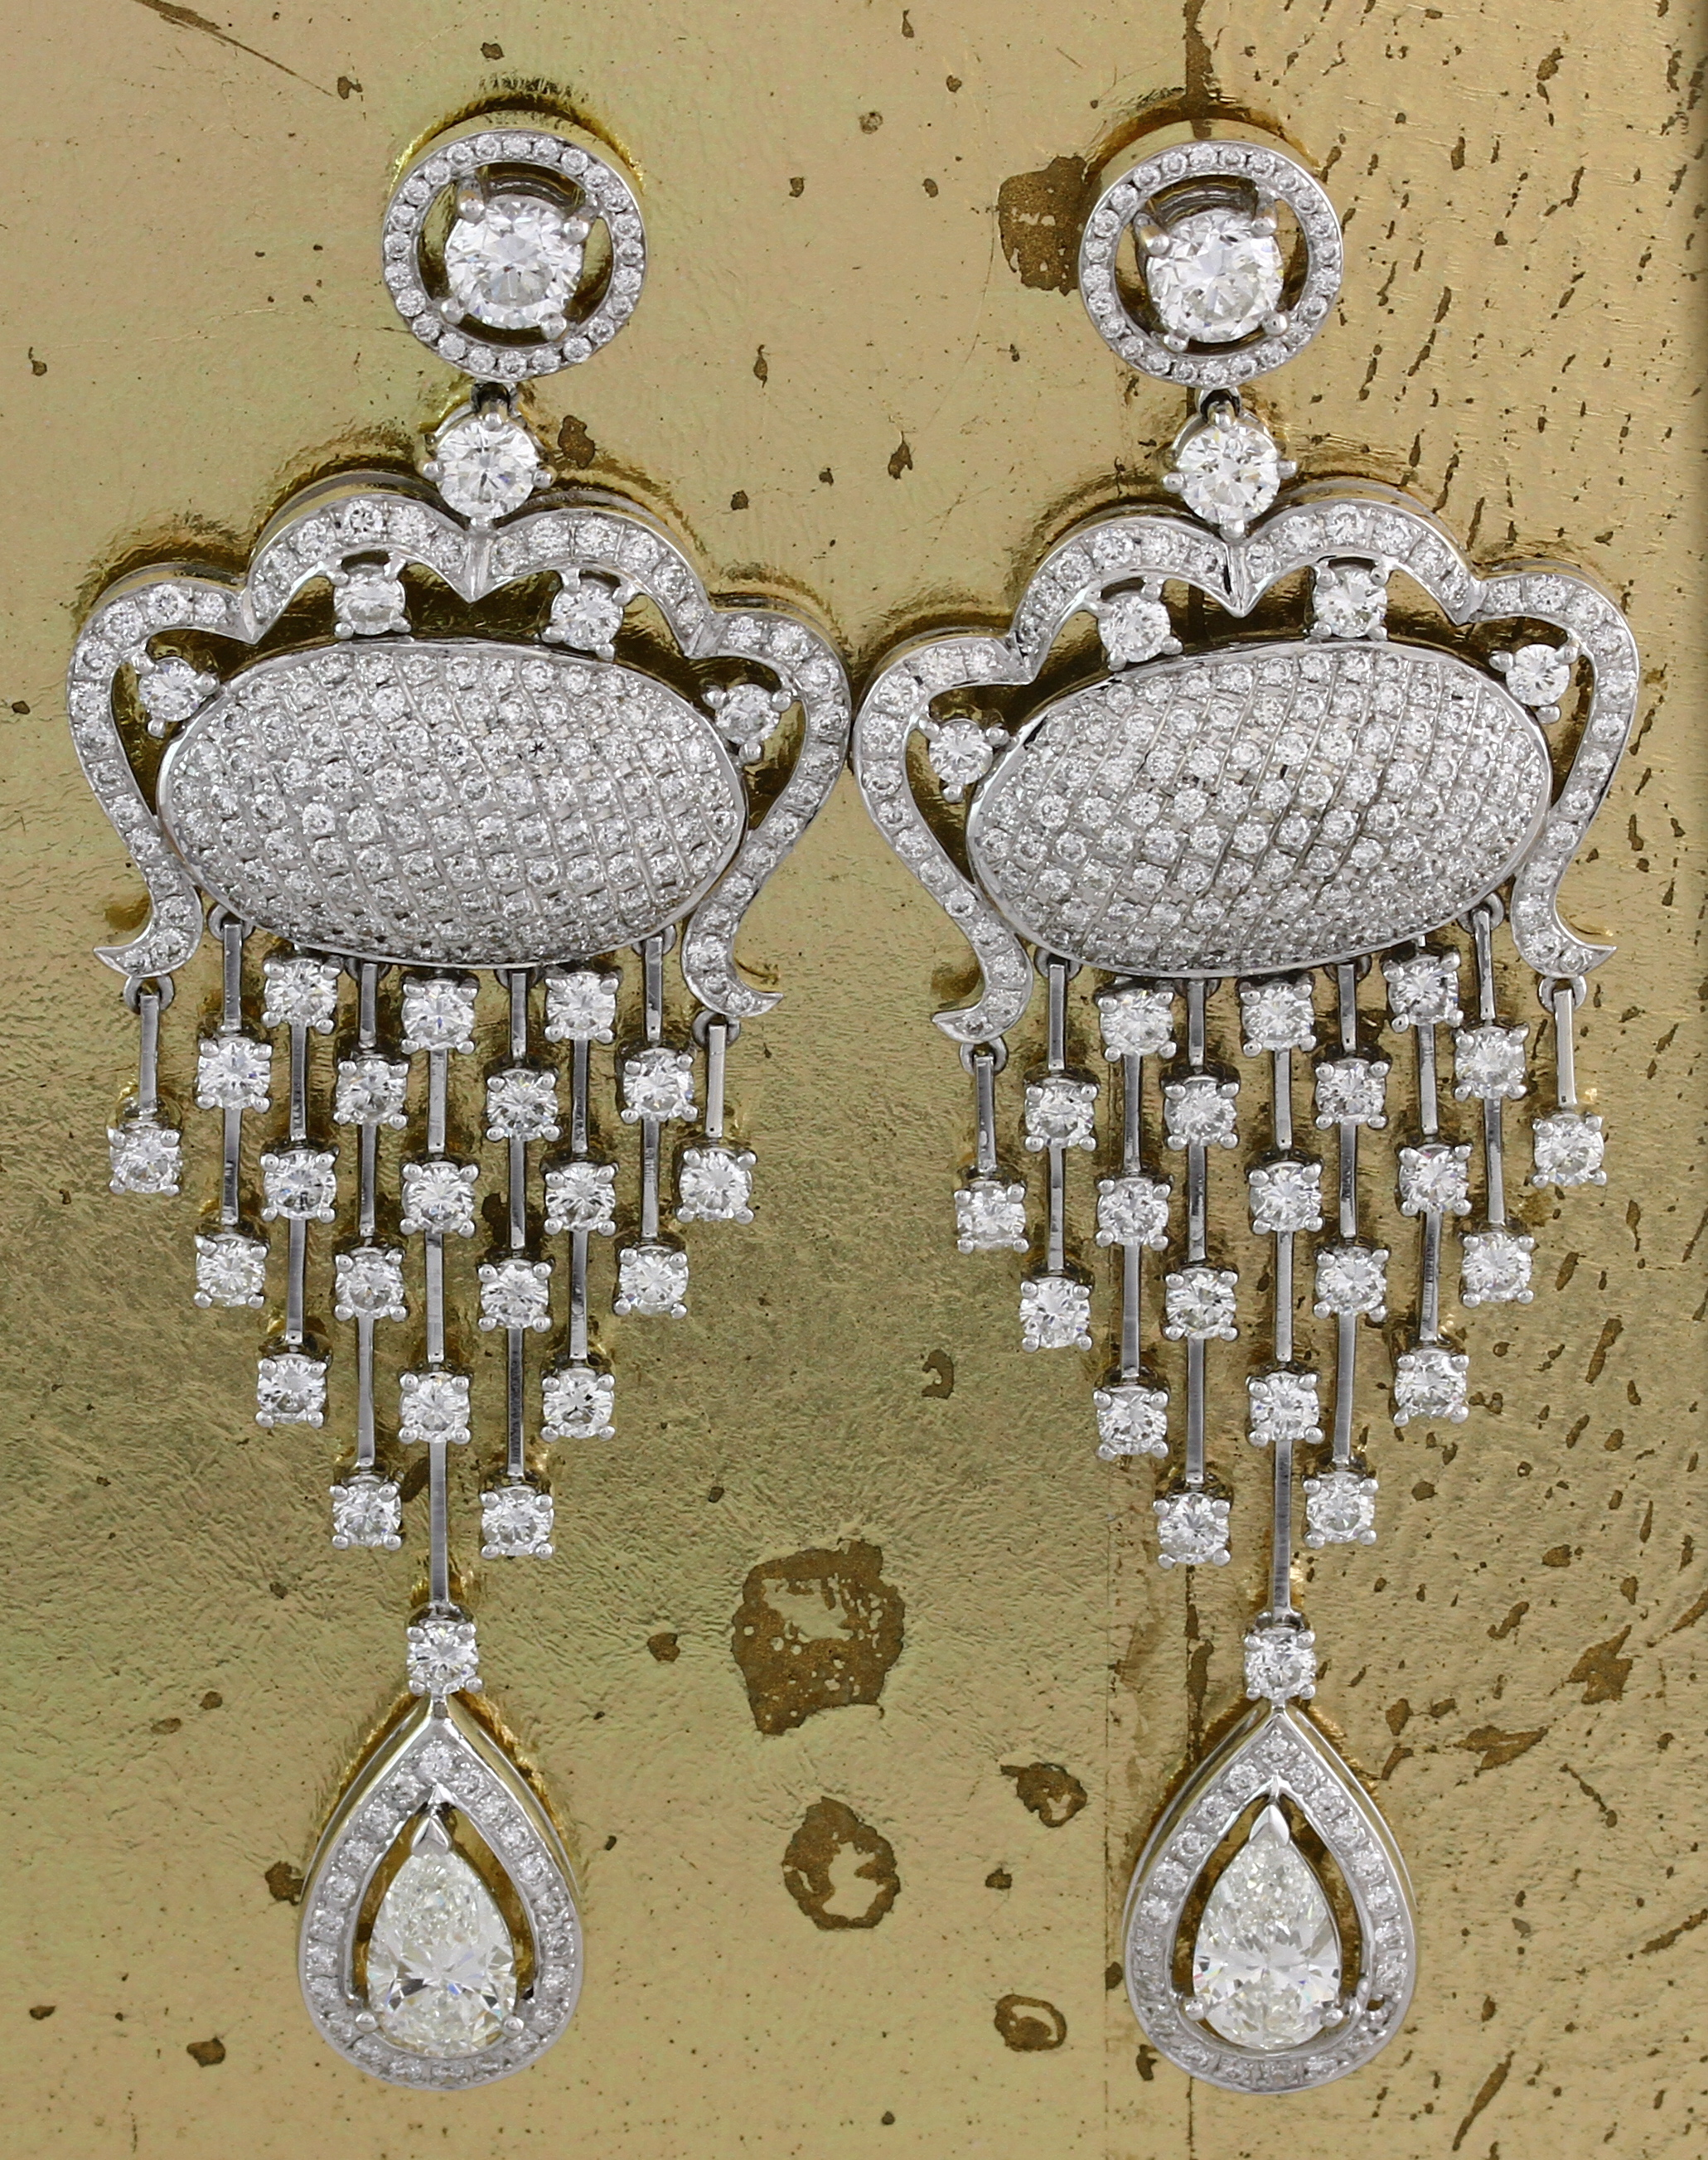 Diamond Earrings - Item No: 0013212